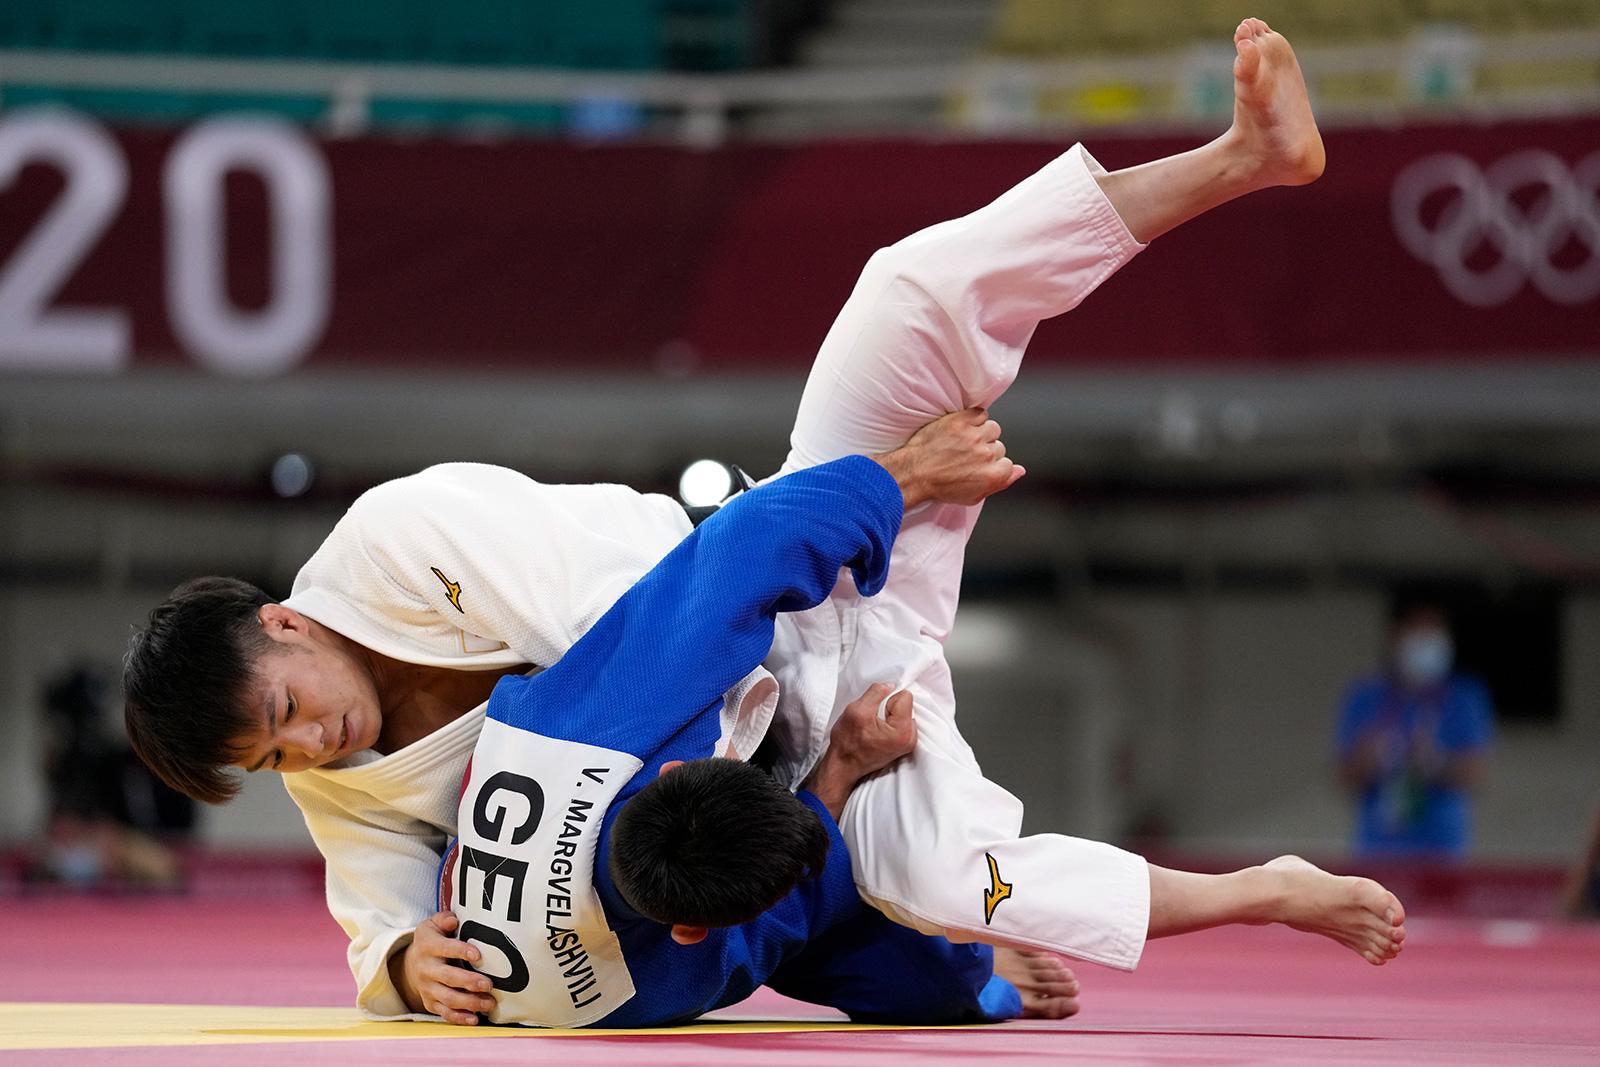 Hifumi Abe of Japan, top, and Vazha Margvelashvili of Georgia compete during their judo match on Sunday, July 25.